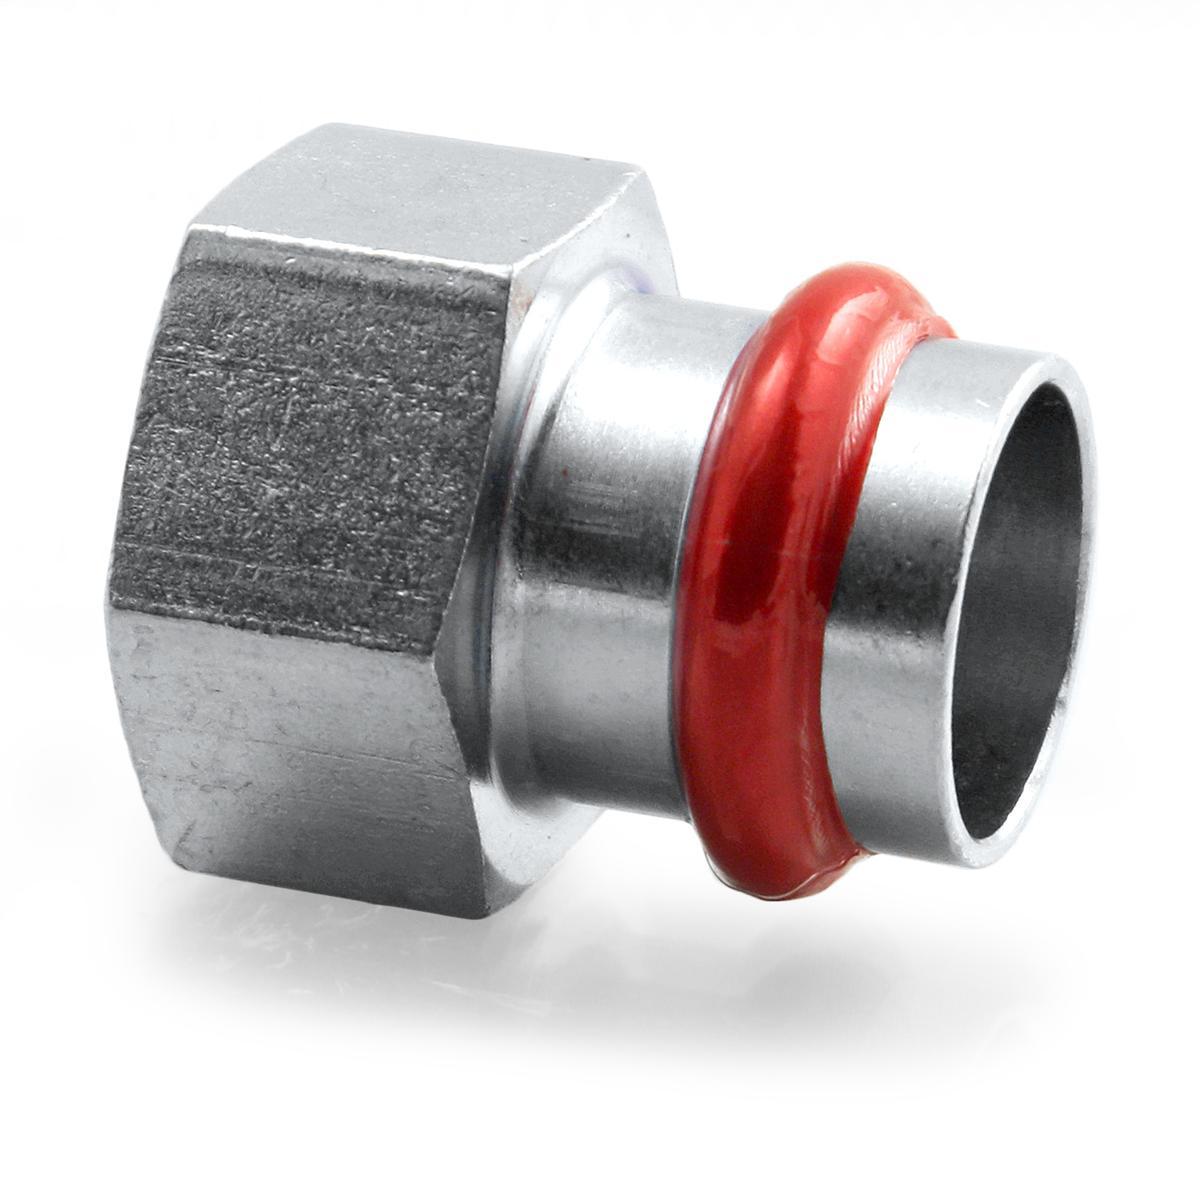 Press Steel Straight Female 3/4Fx22